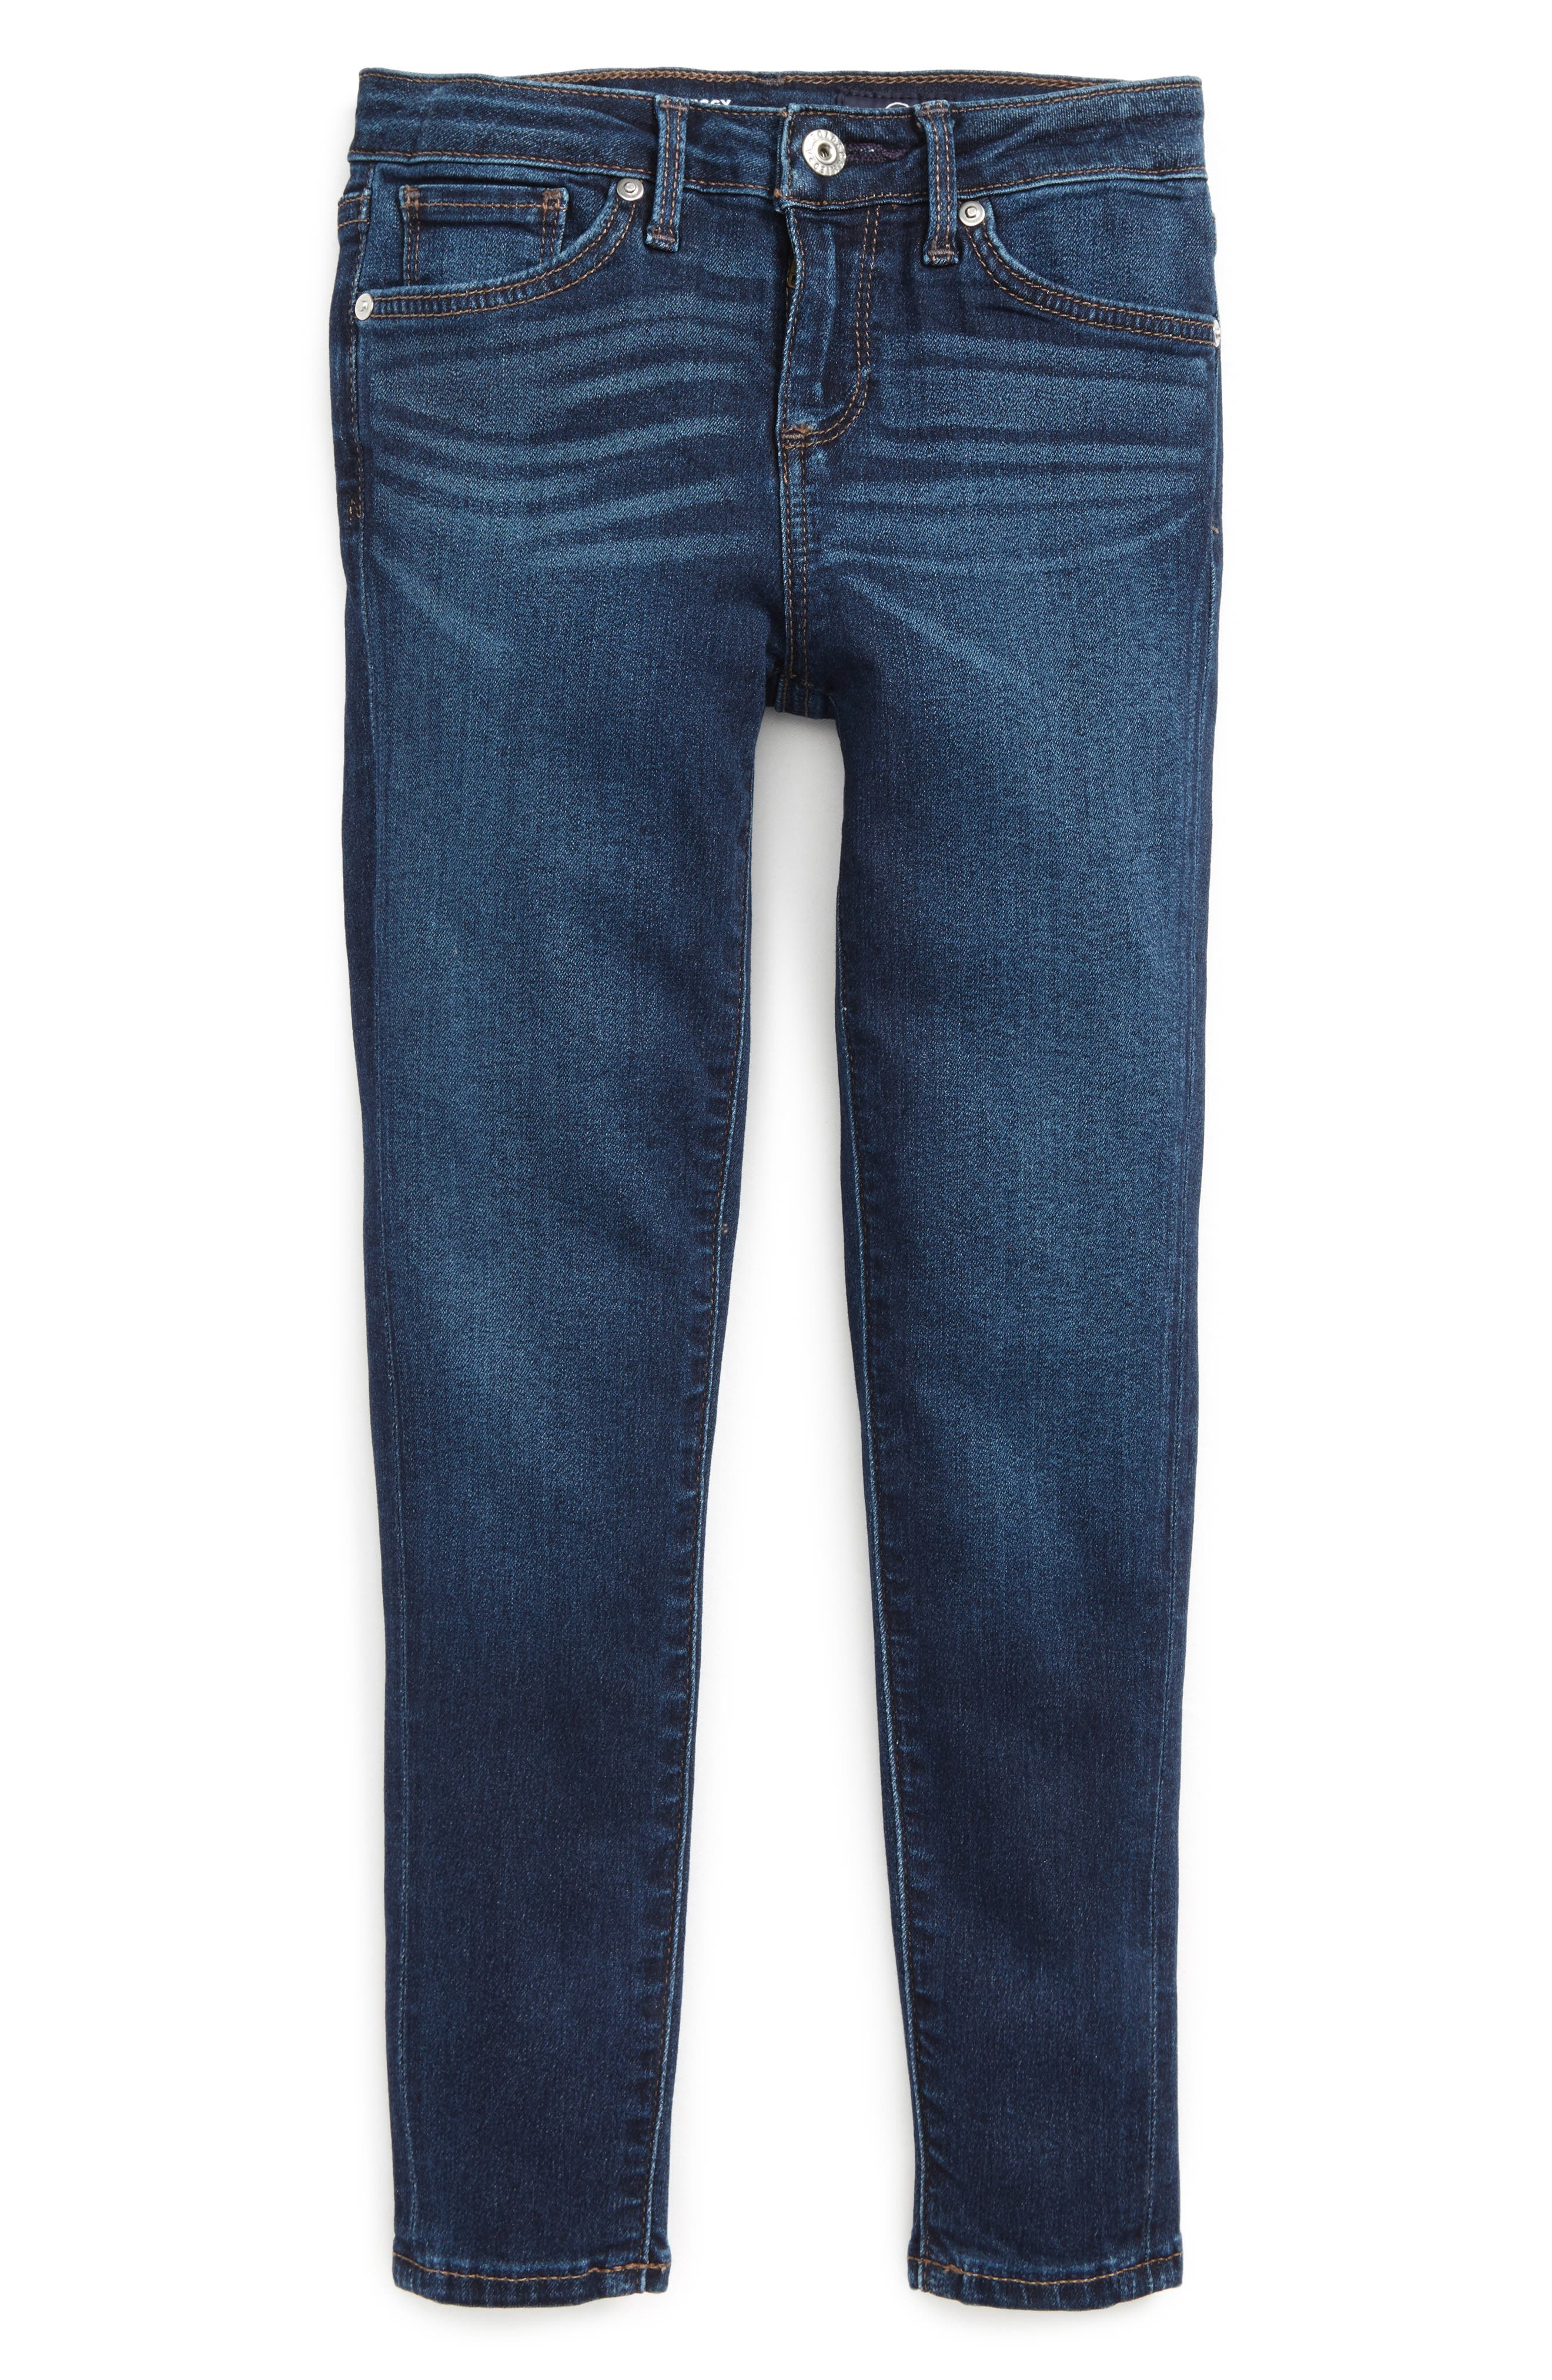 ag adriano goldschmied kids Twiggy Skinny Ankle Jeans (Toddler Girls & Little Girls)